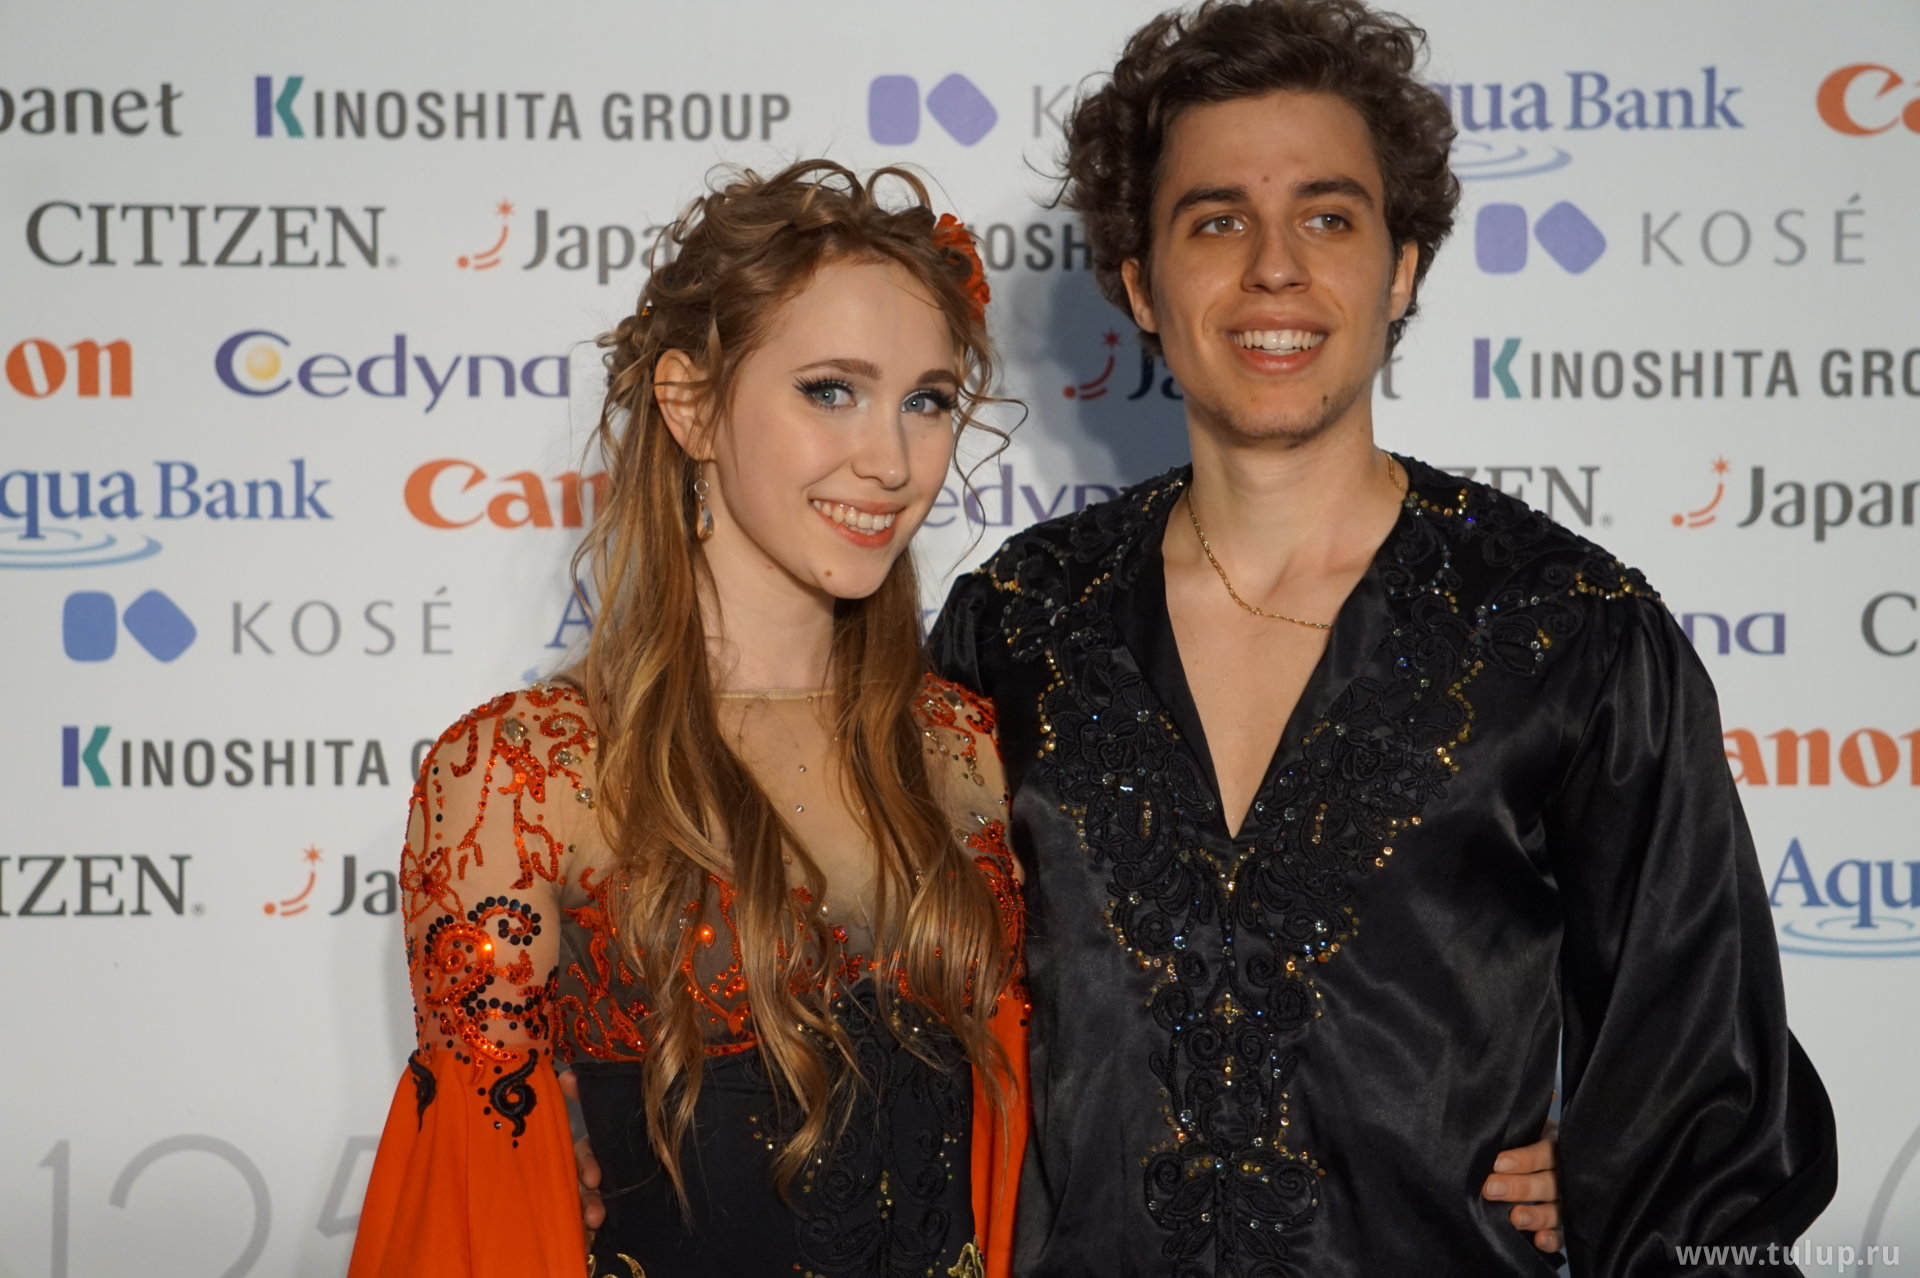 https://www.tulup.ru/photo/media/galleries/2017-03-15.junior_world_championships/18_mar_dance_backstage_2/big/DSC06473.JPG